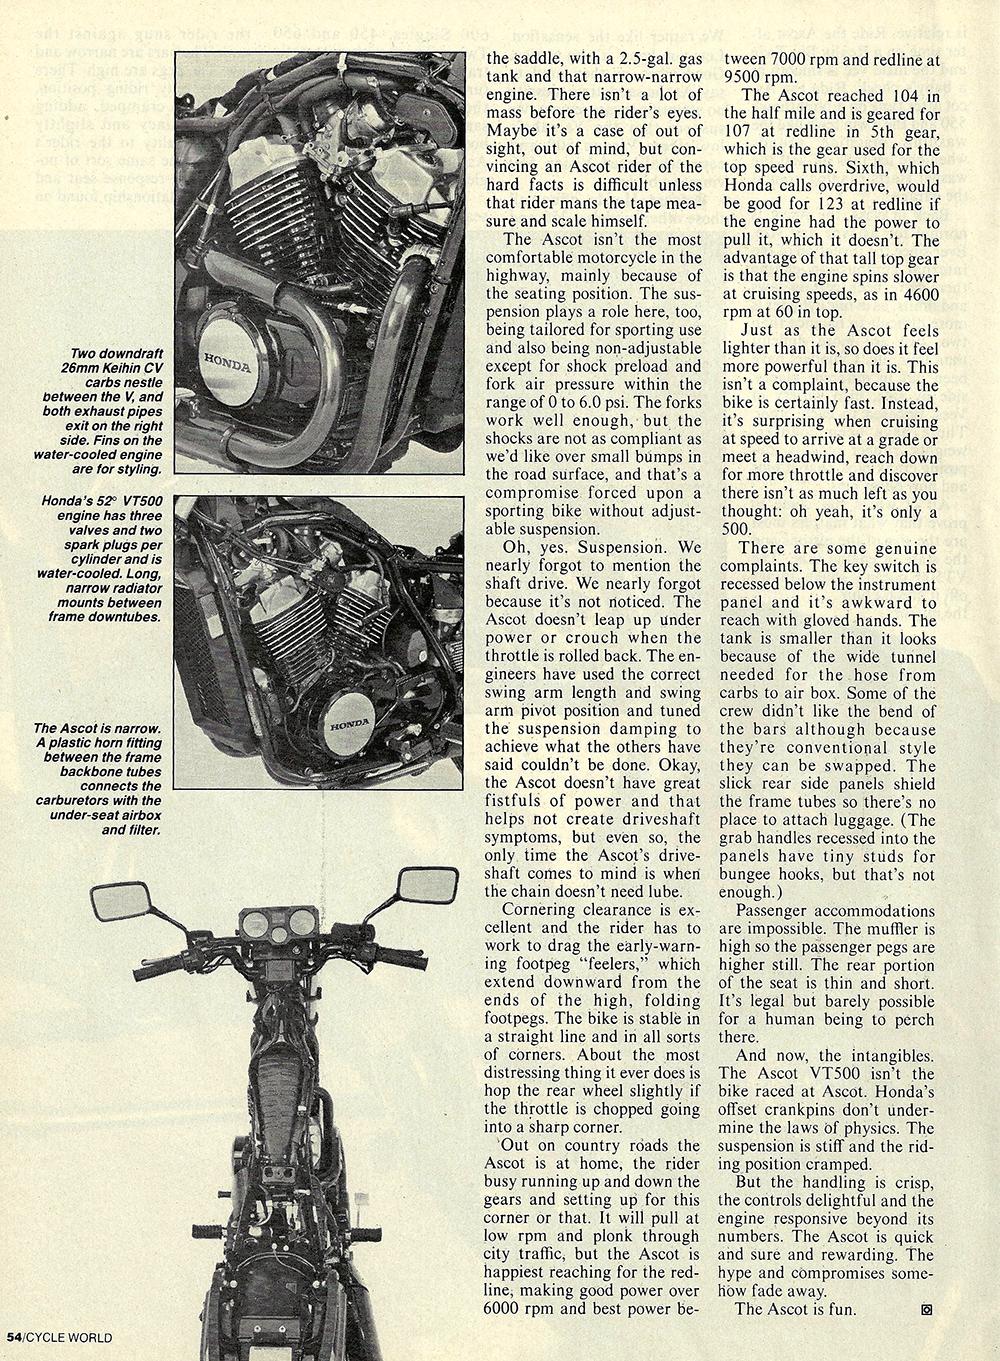 1983 Honda VT500 Ascot road test 2 05.JPG